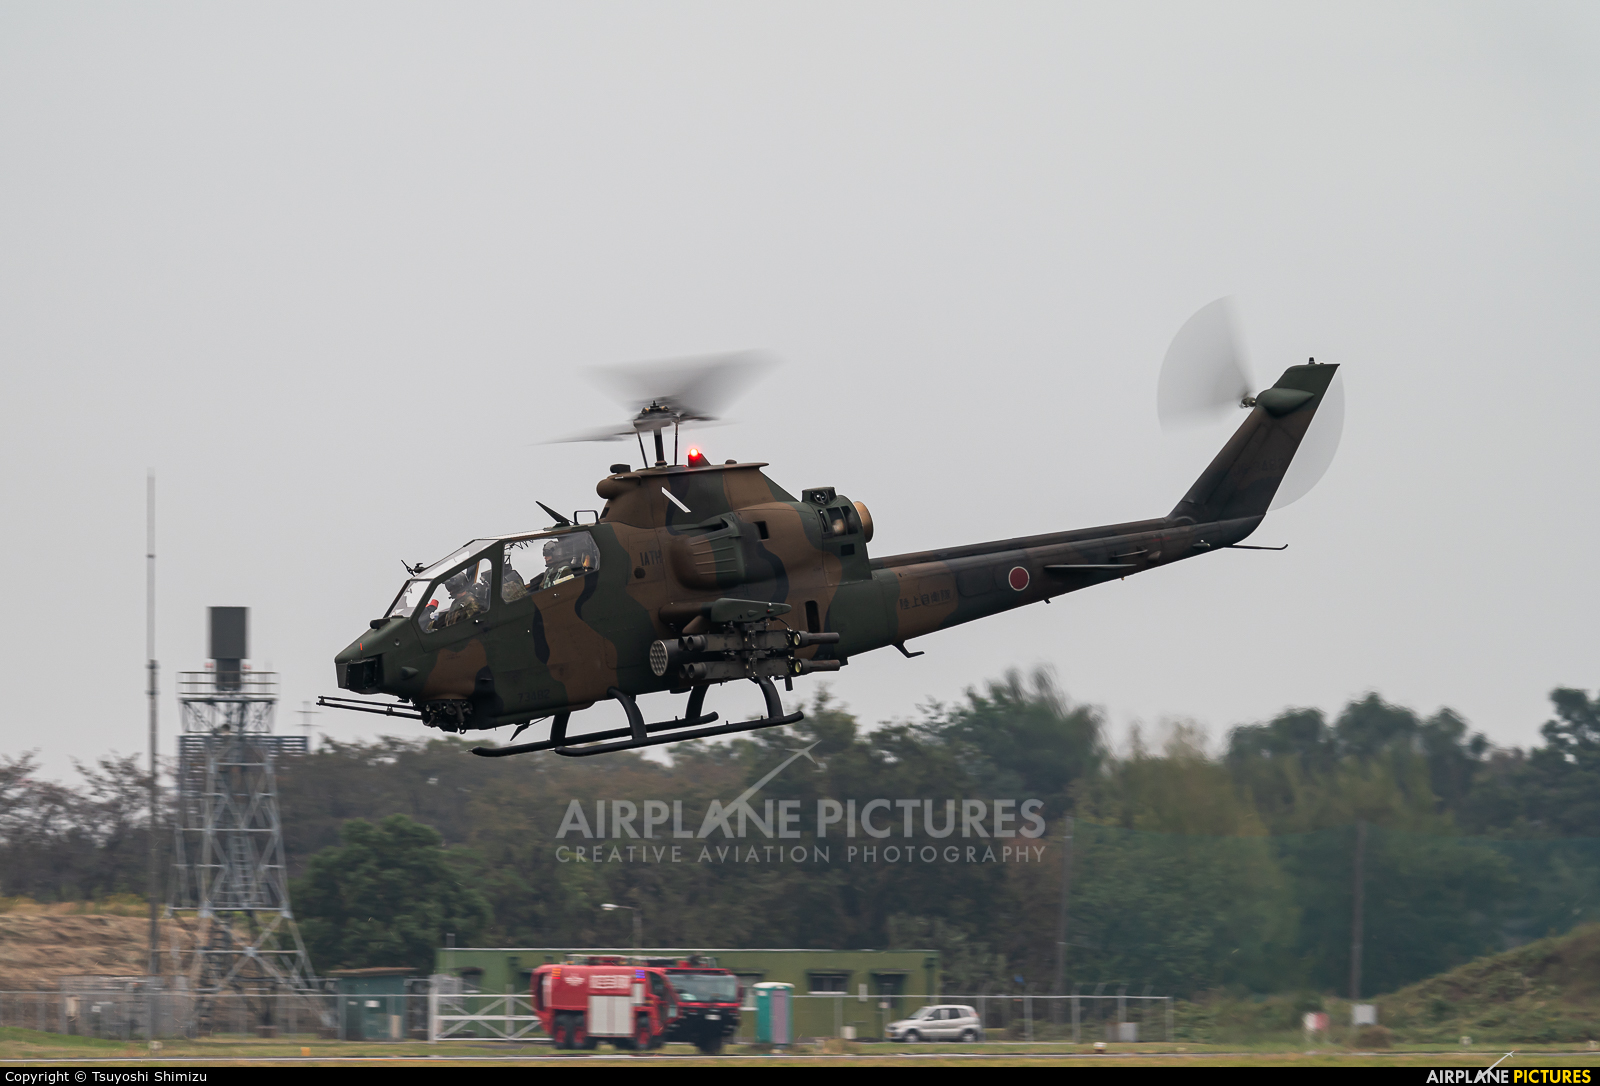 Japan - Ground Self Defense Force 73482 aircraft at Iruma AB